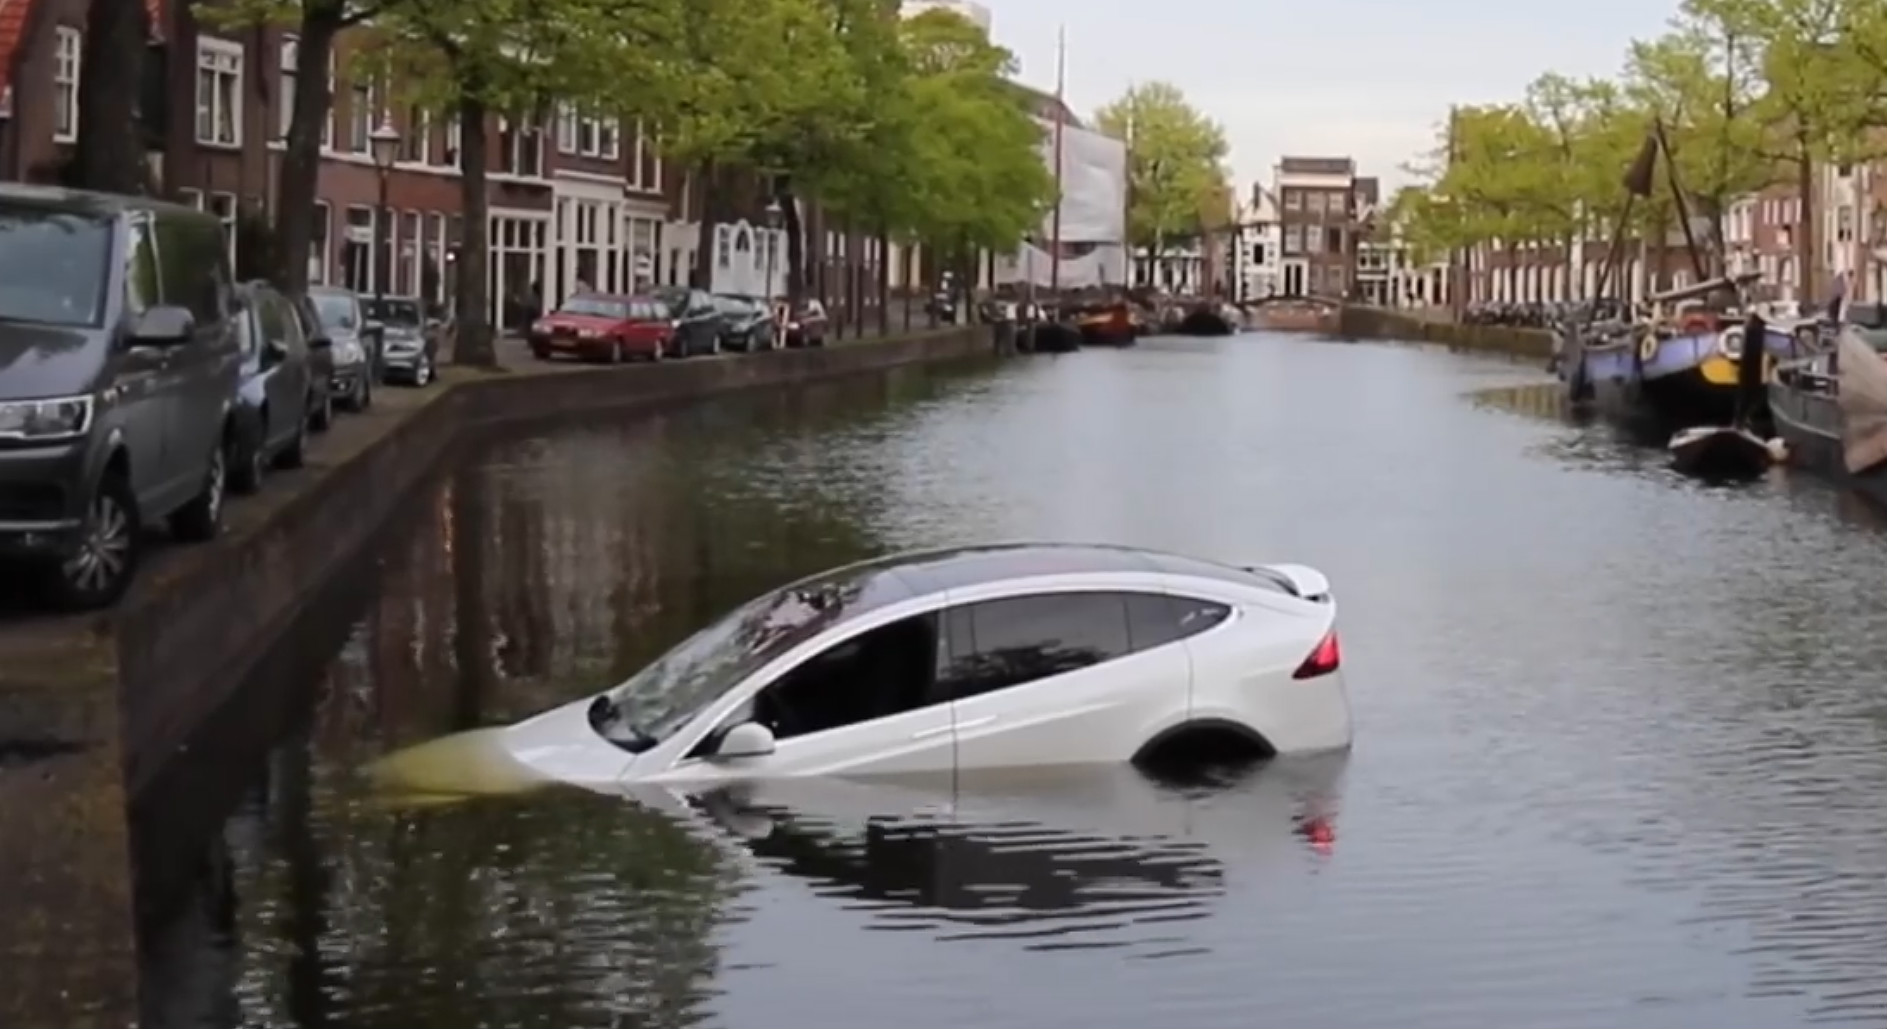 Model X sinks dutch canal 3 [Credit: Flashphoto NL/YouTube]